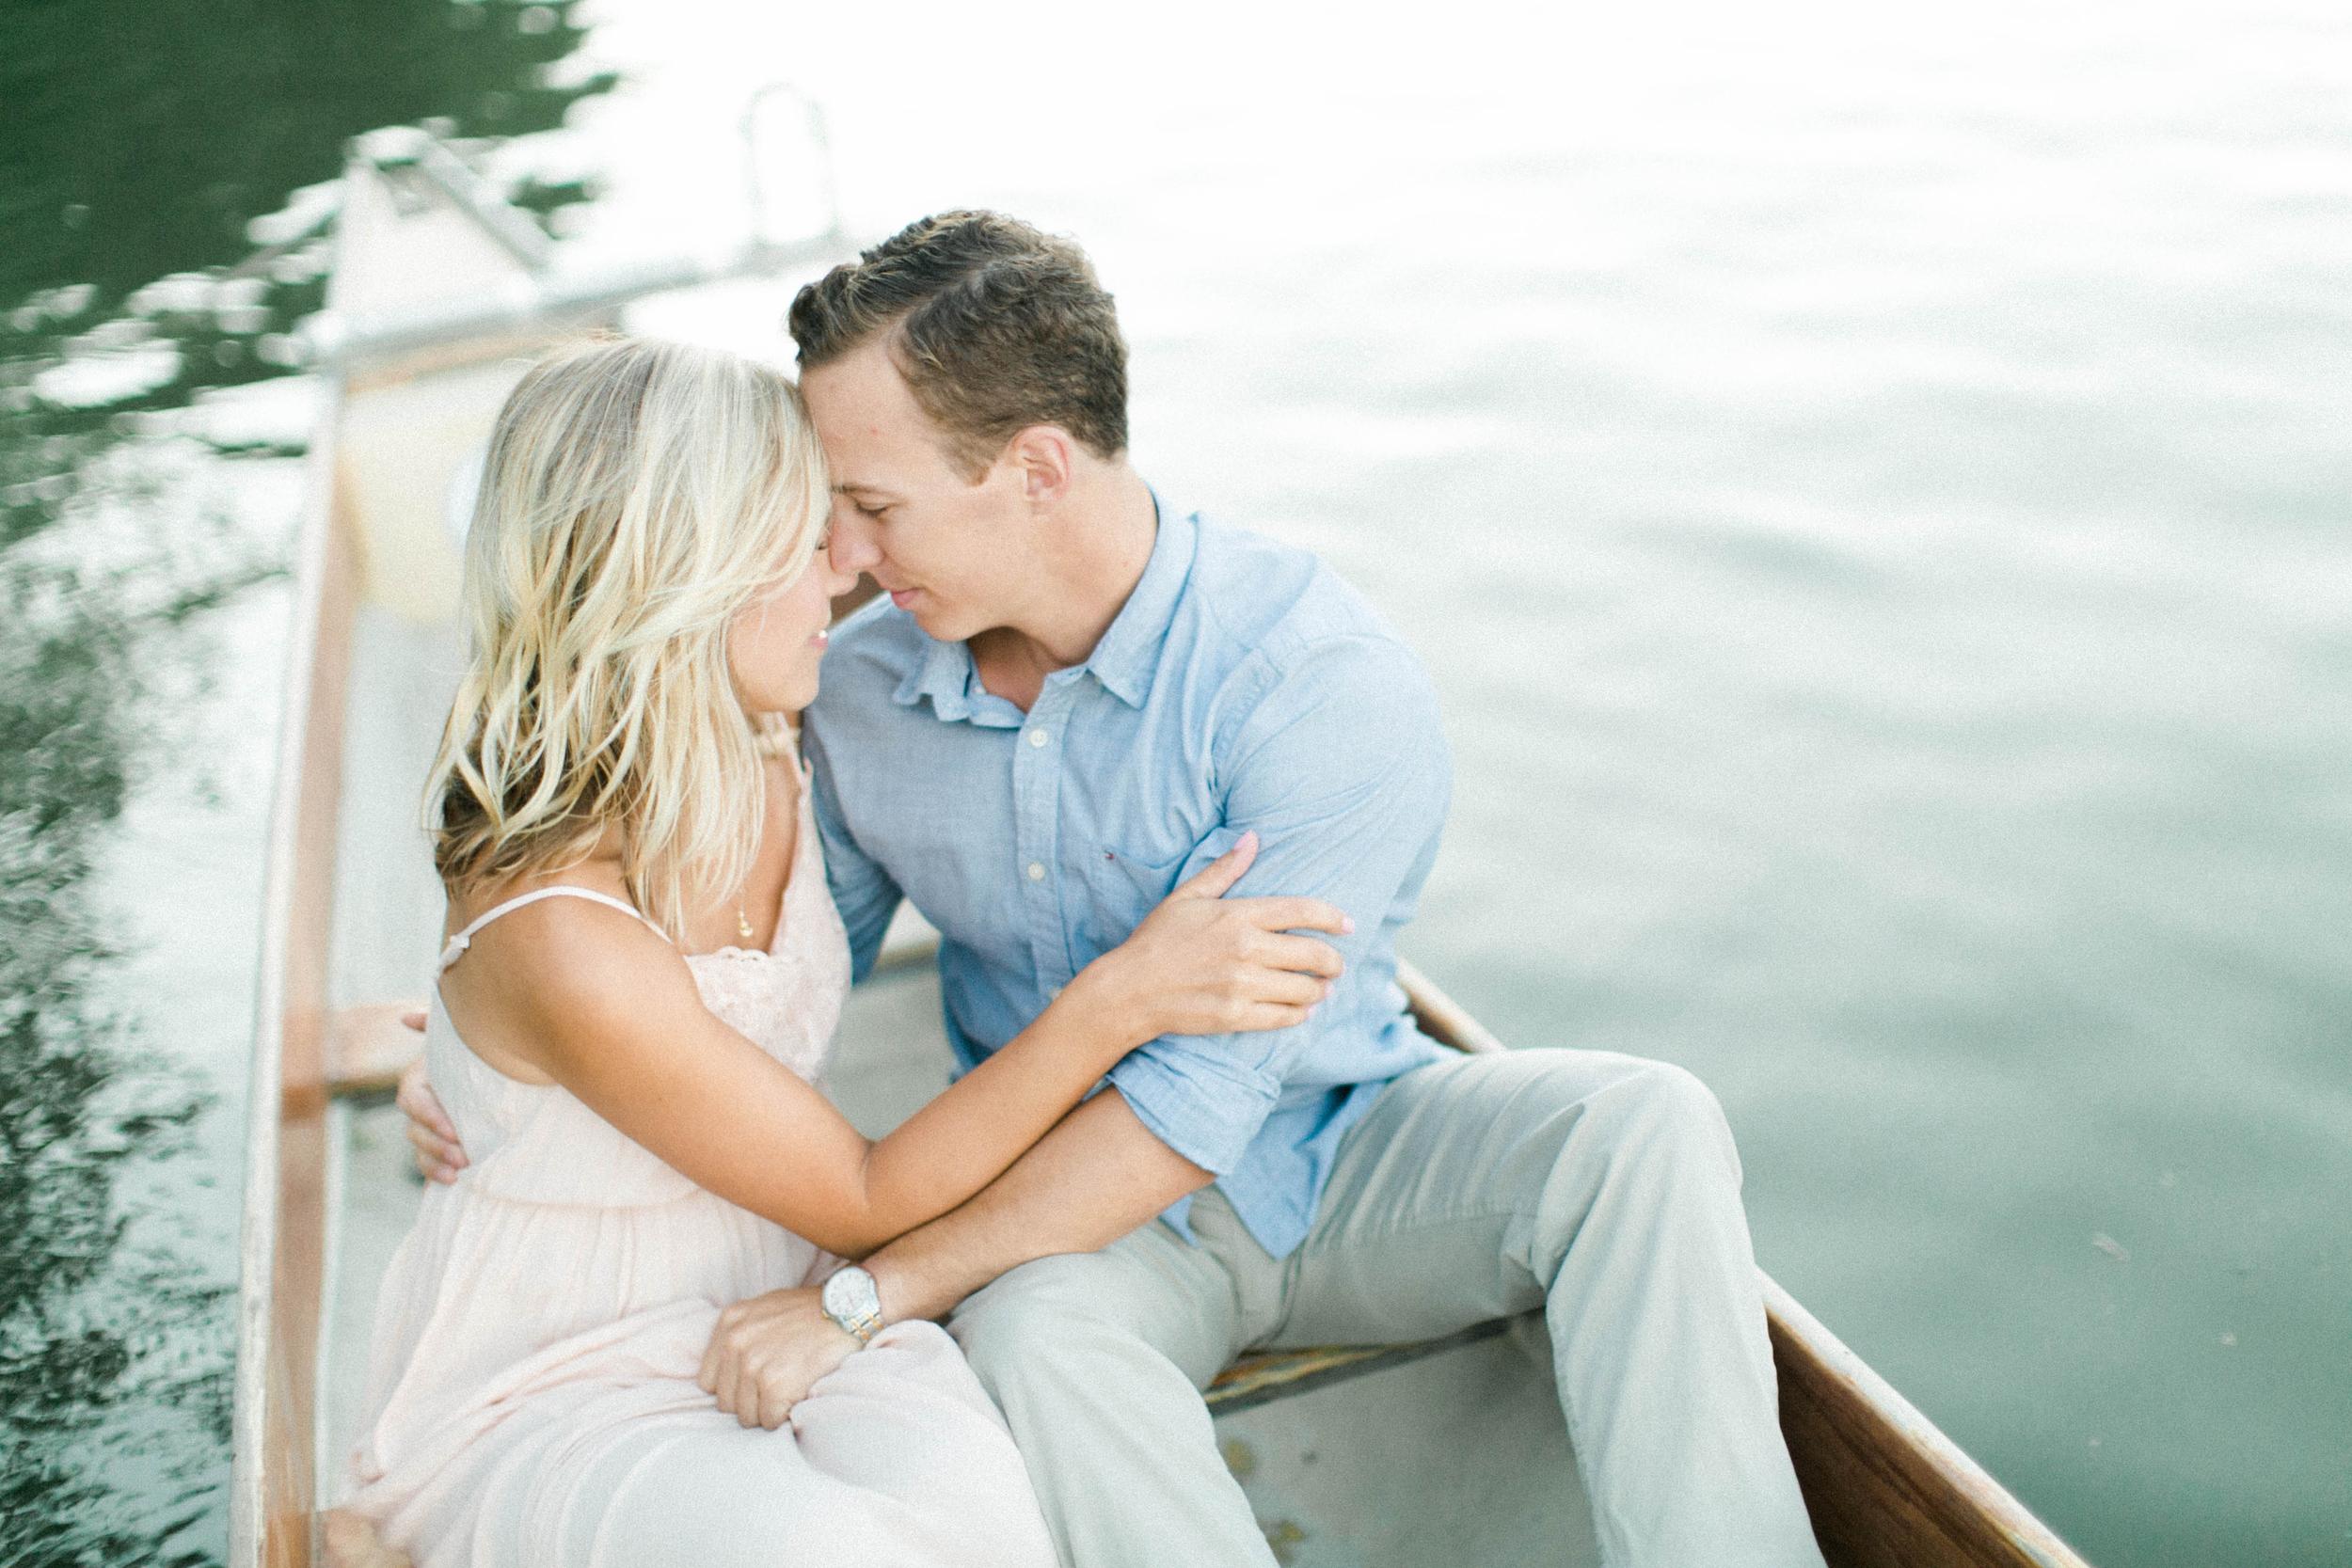 toronto-ontario-wedding-photographer-richelle-hunter-photography-meghan-dustin-3.jpg